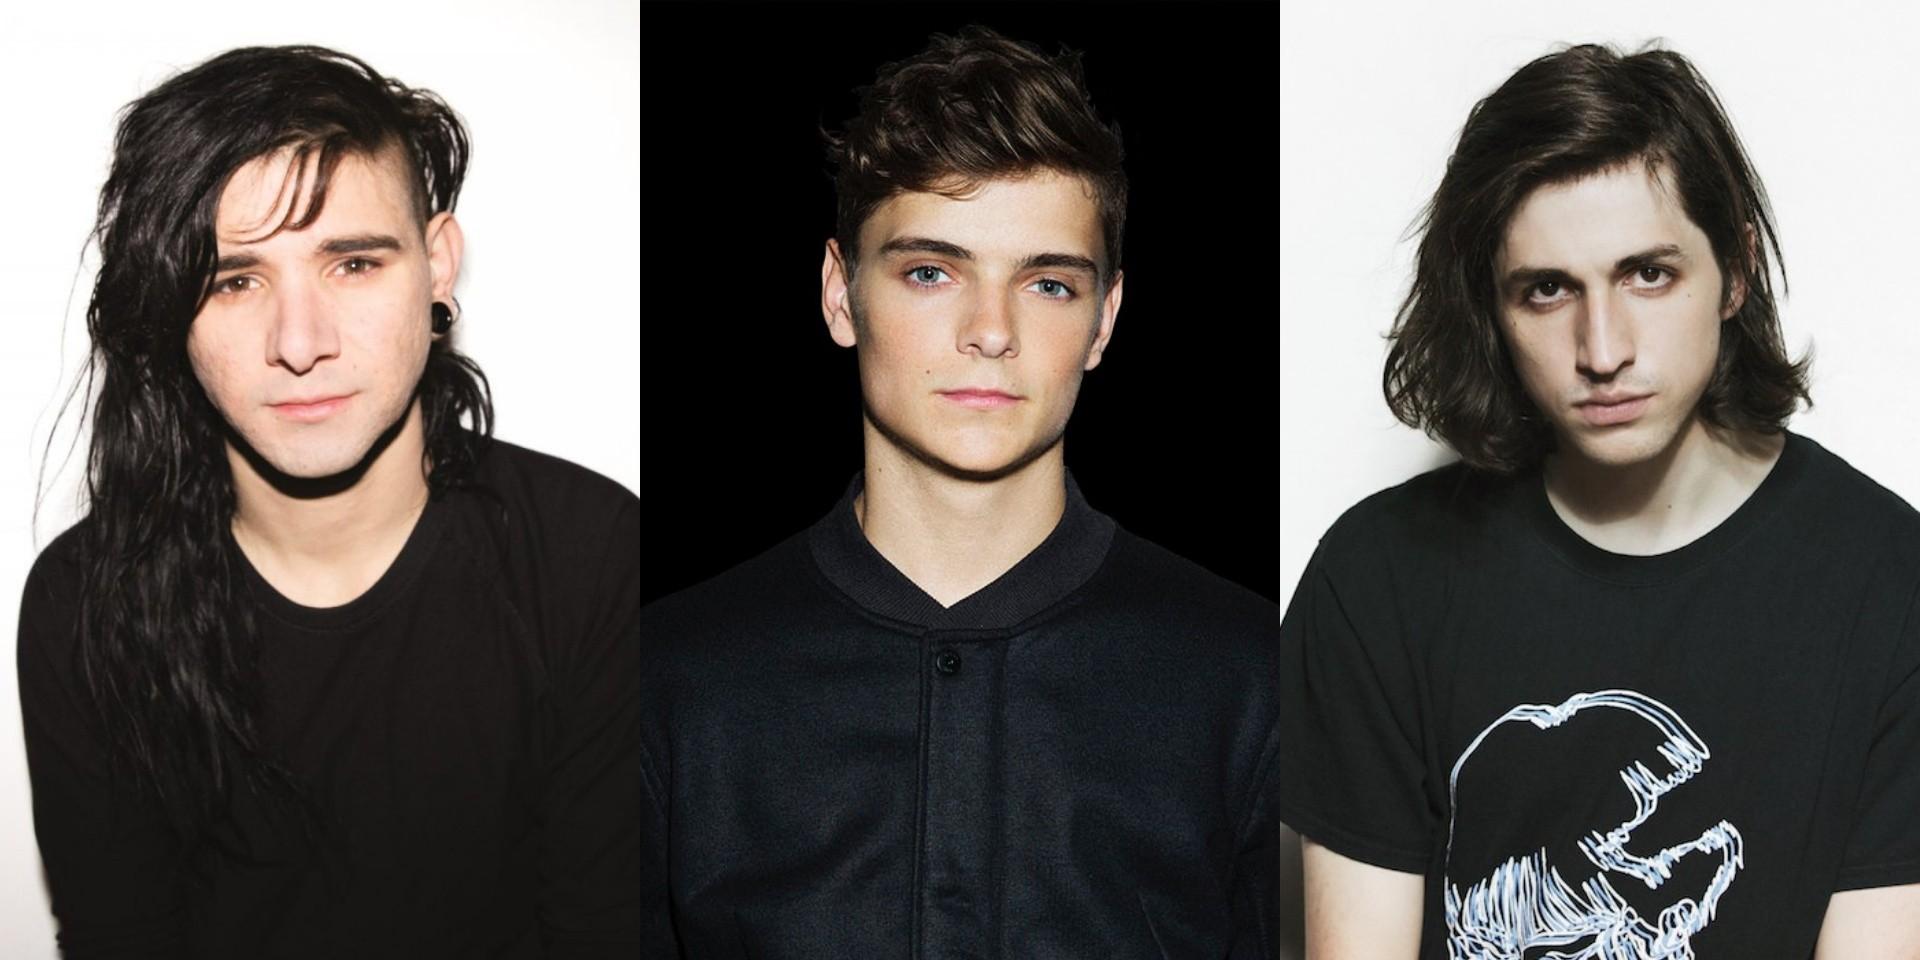 Ultra Singapore announces first wave lineup: Martin Garrix, Porter Robinson, Skrillex to headline